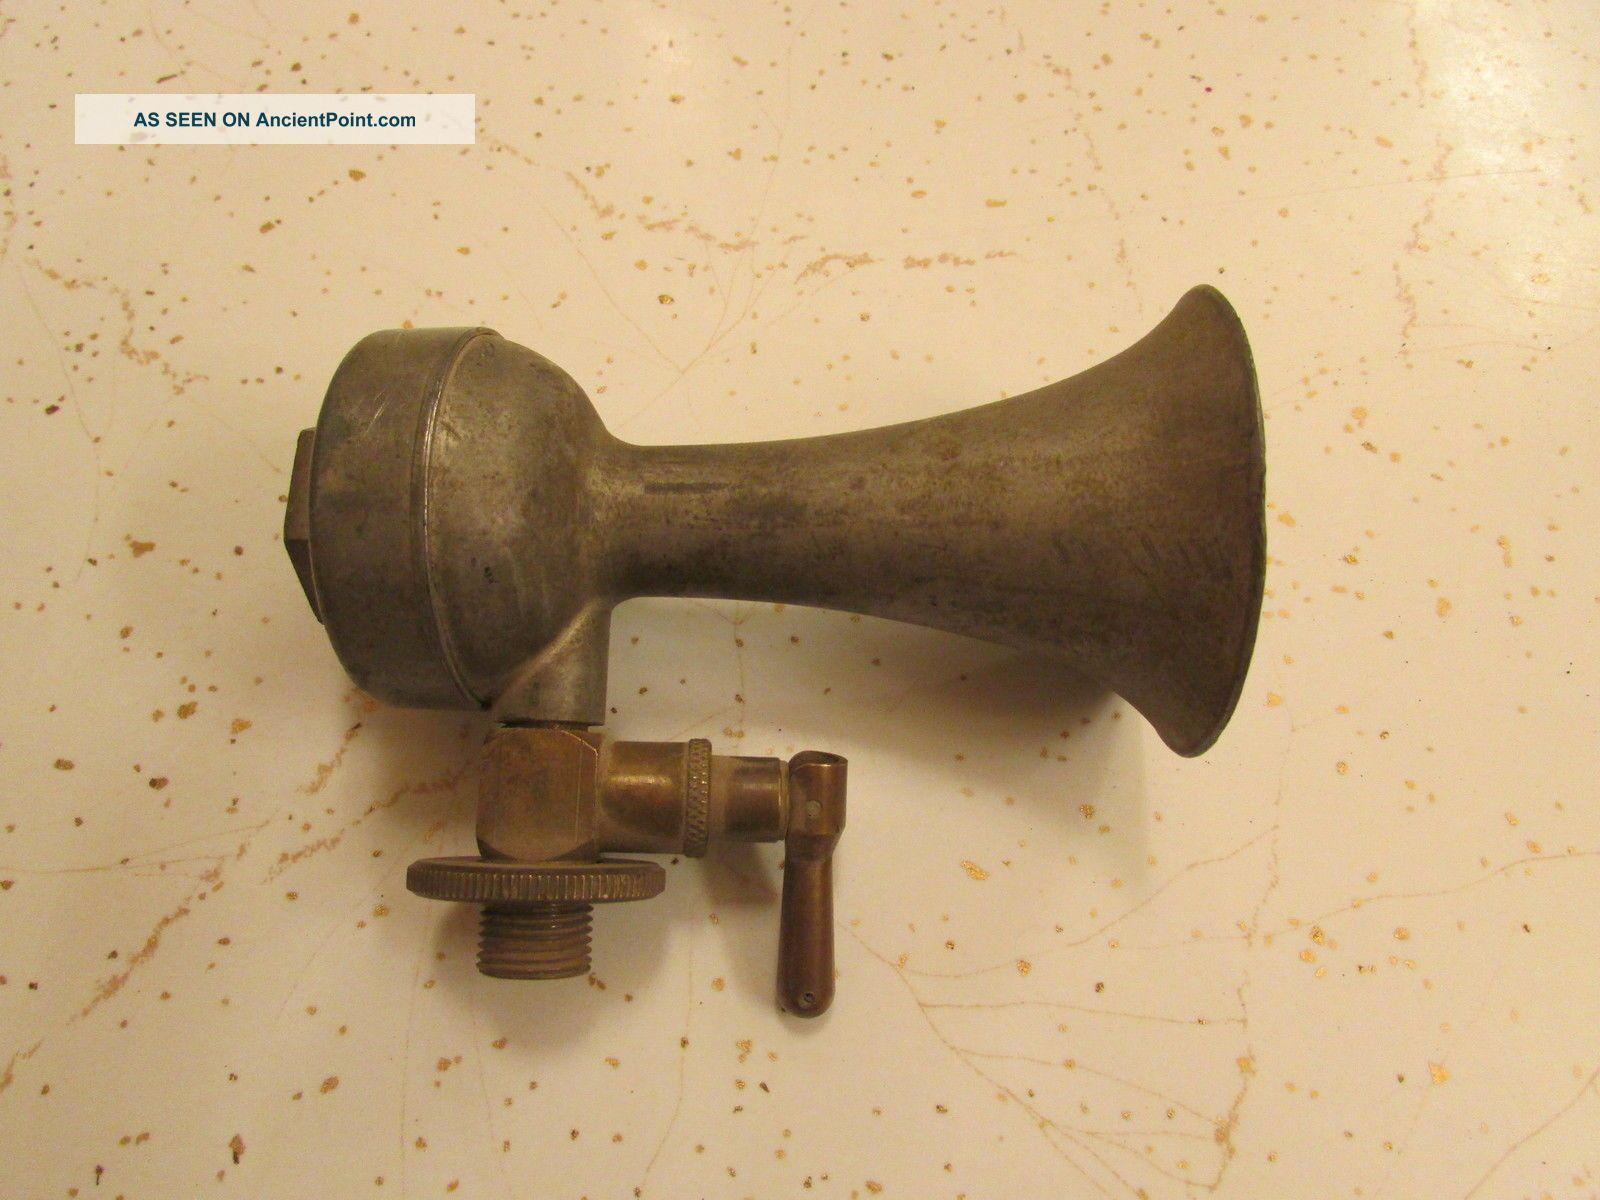 Falcon Air Whistle Horn Tugboat Tug Ship Boat Sailboat Bells & Whistles photo